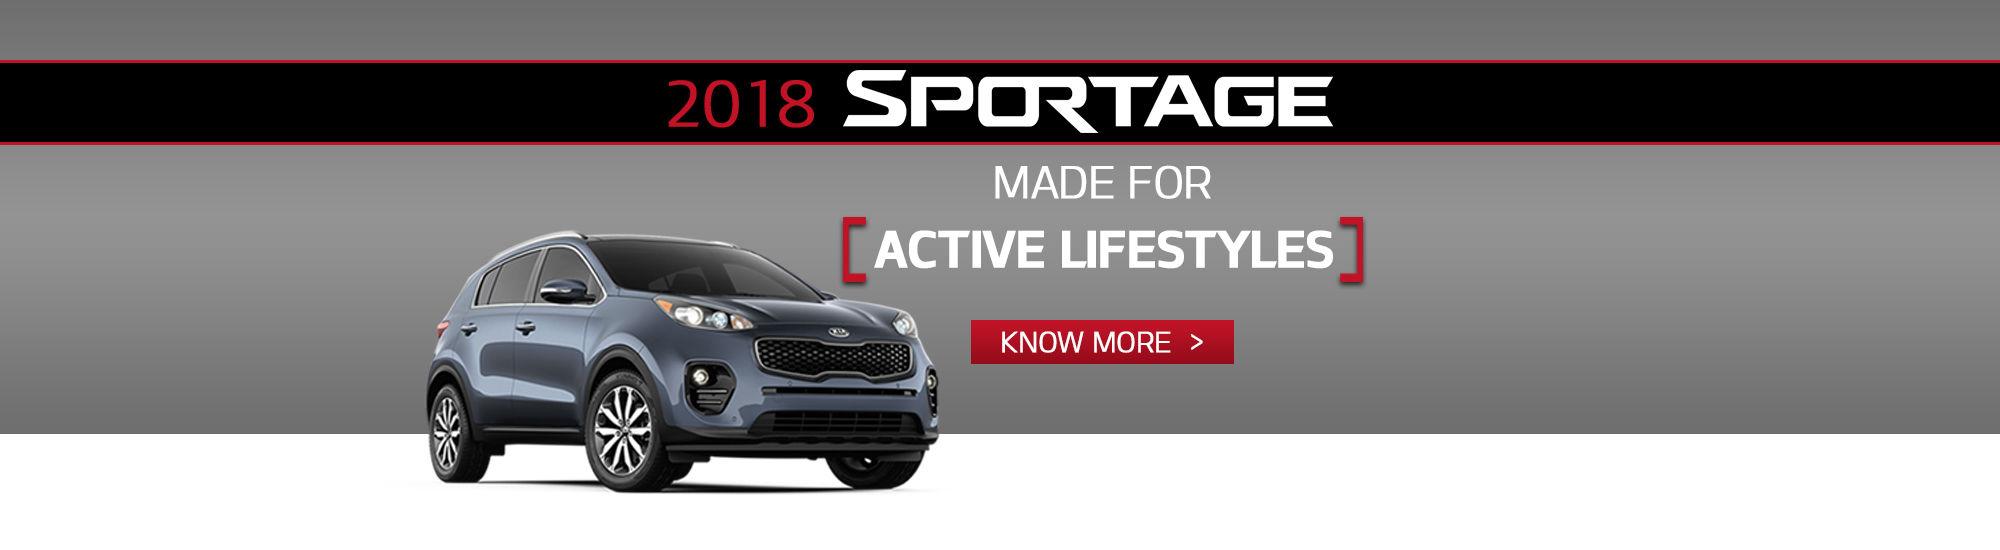 2018 sportage